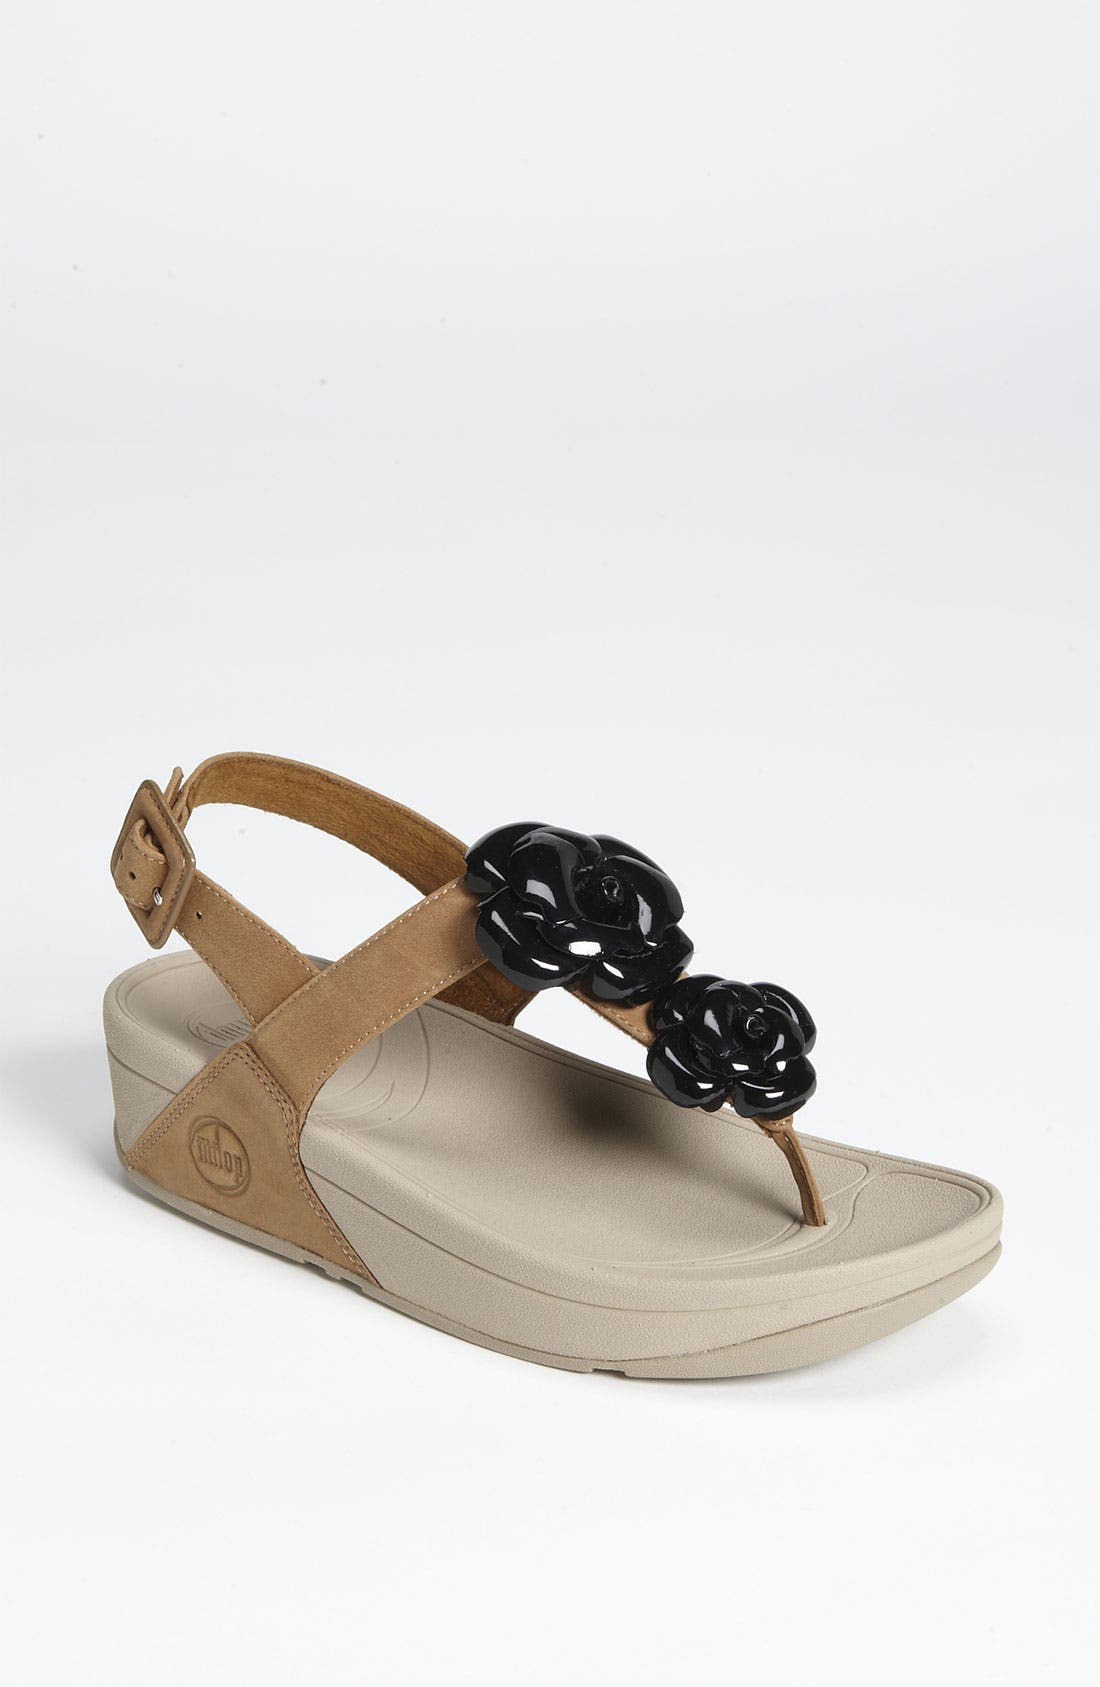 Main Image - FitFlop 'Floretta' Sandal